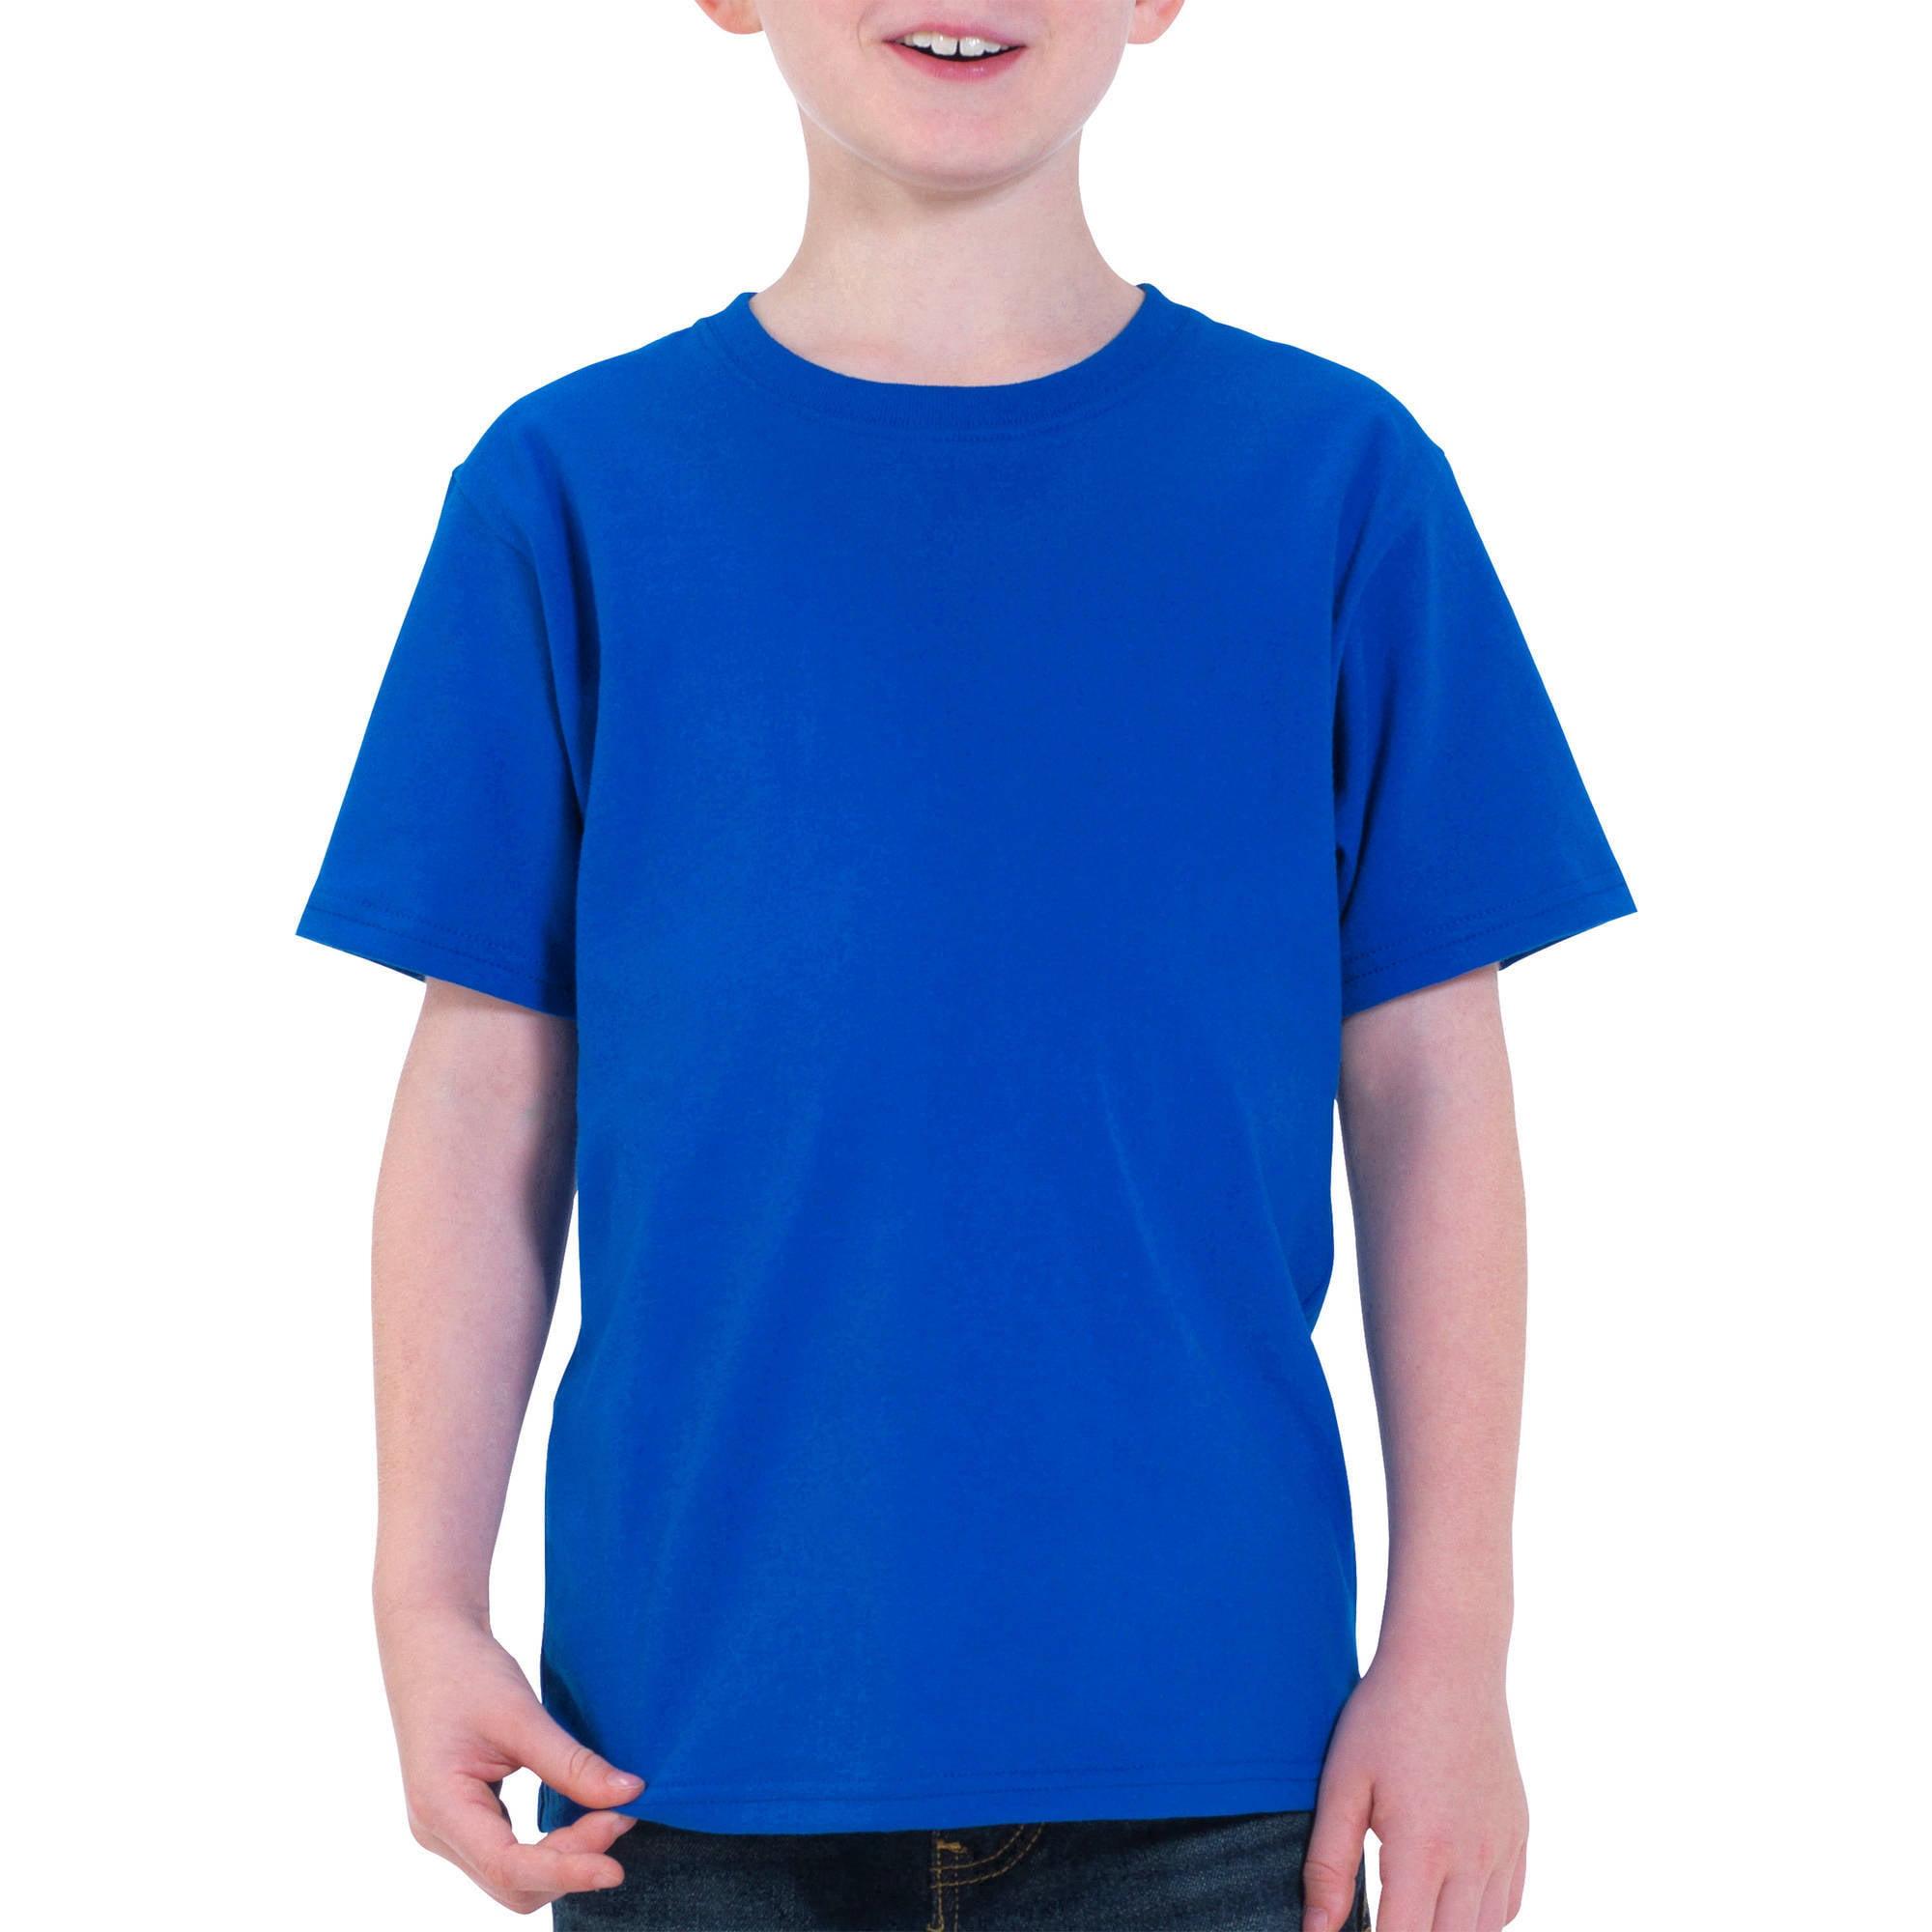 Fruit of the Loom Boys' Short Sleeve Crew Neck T Shirt